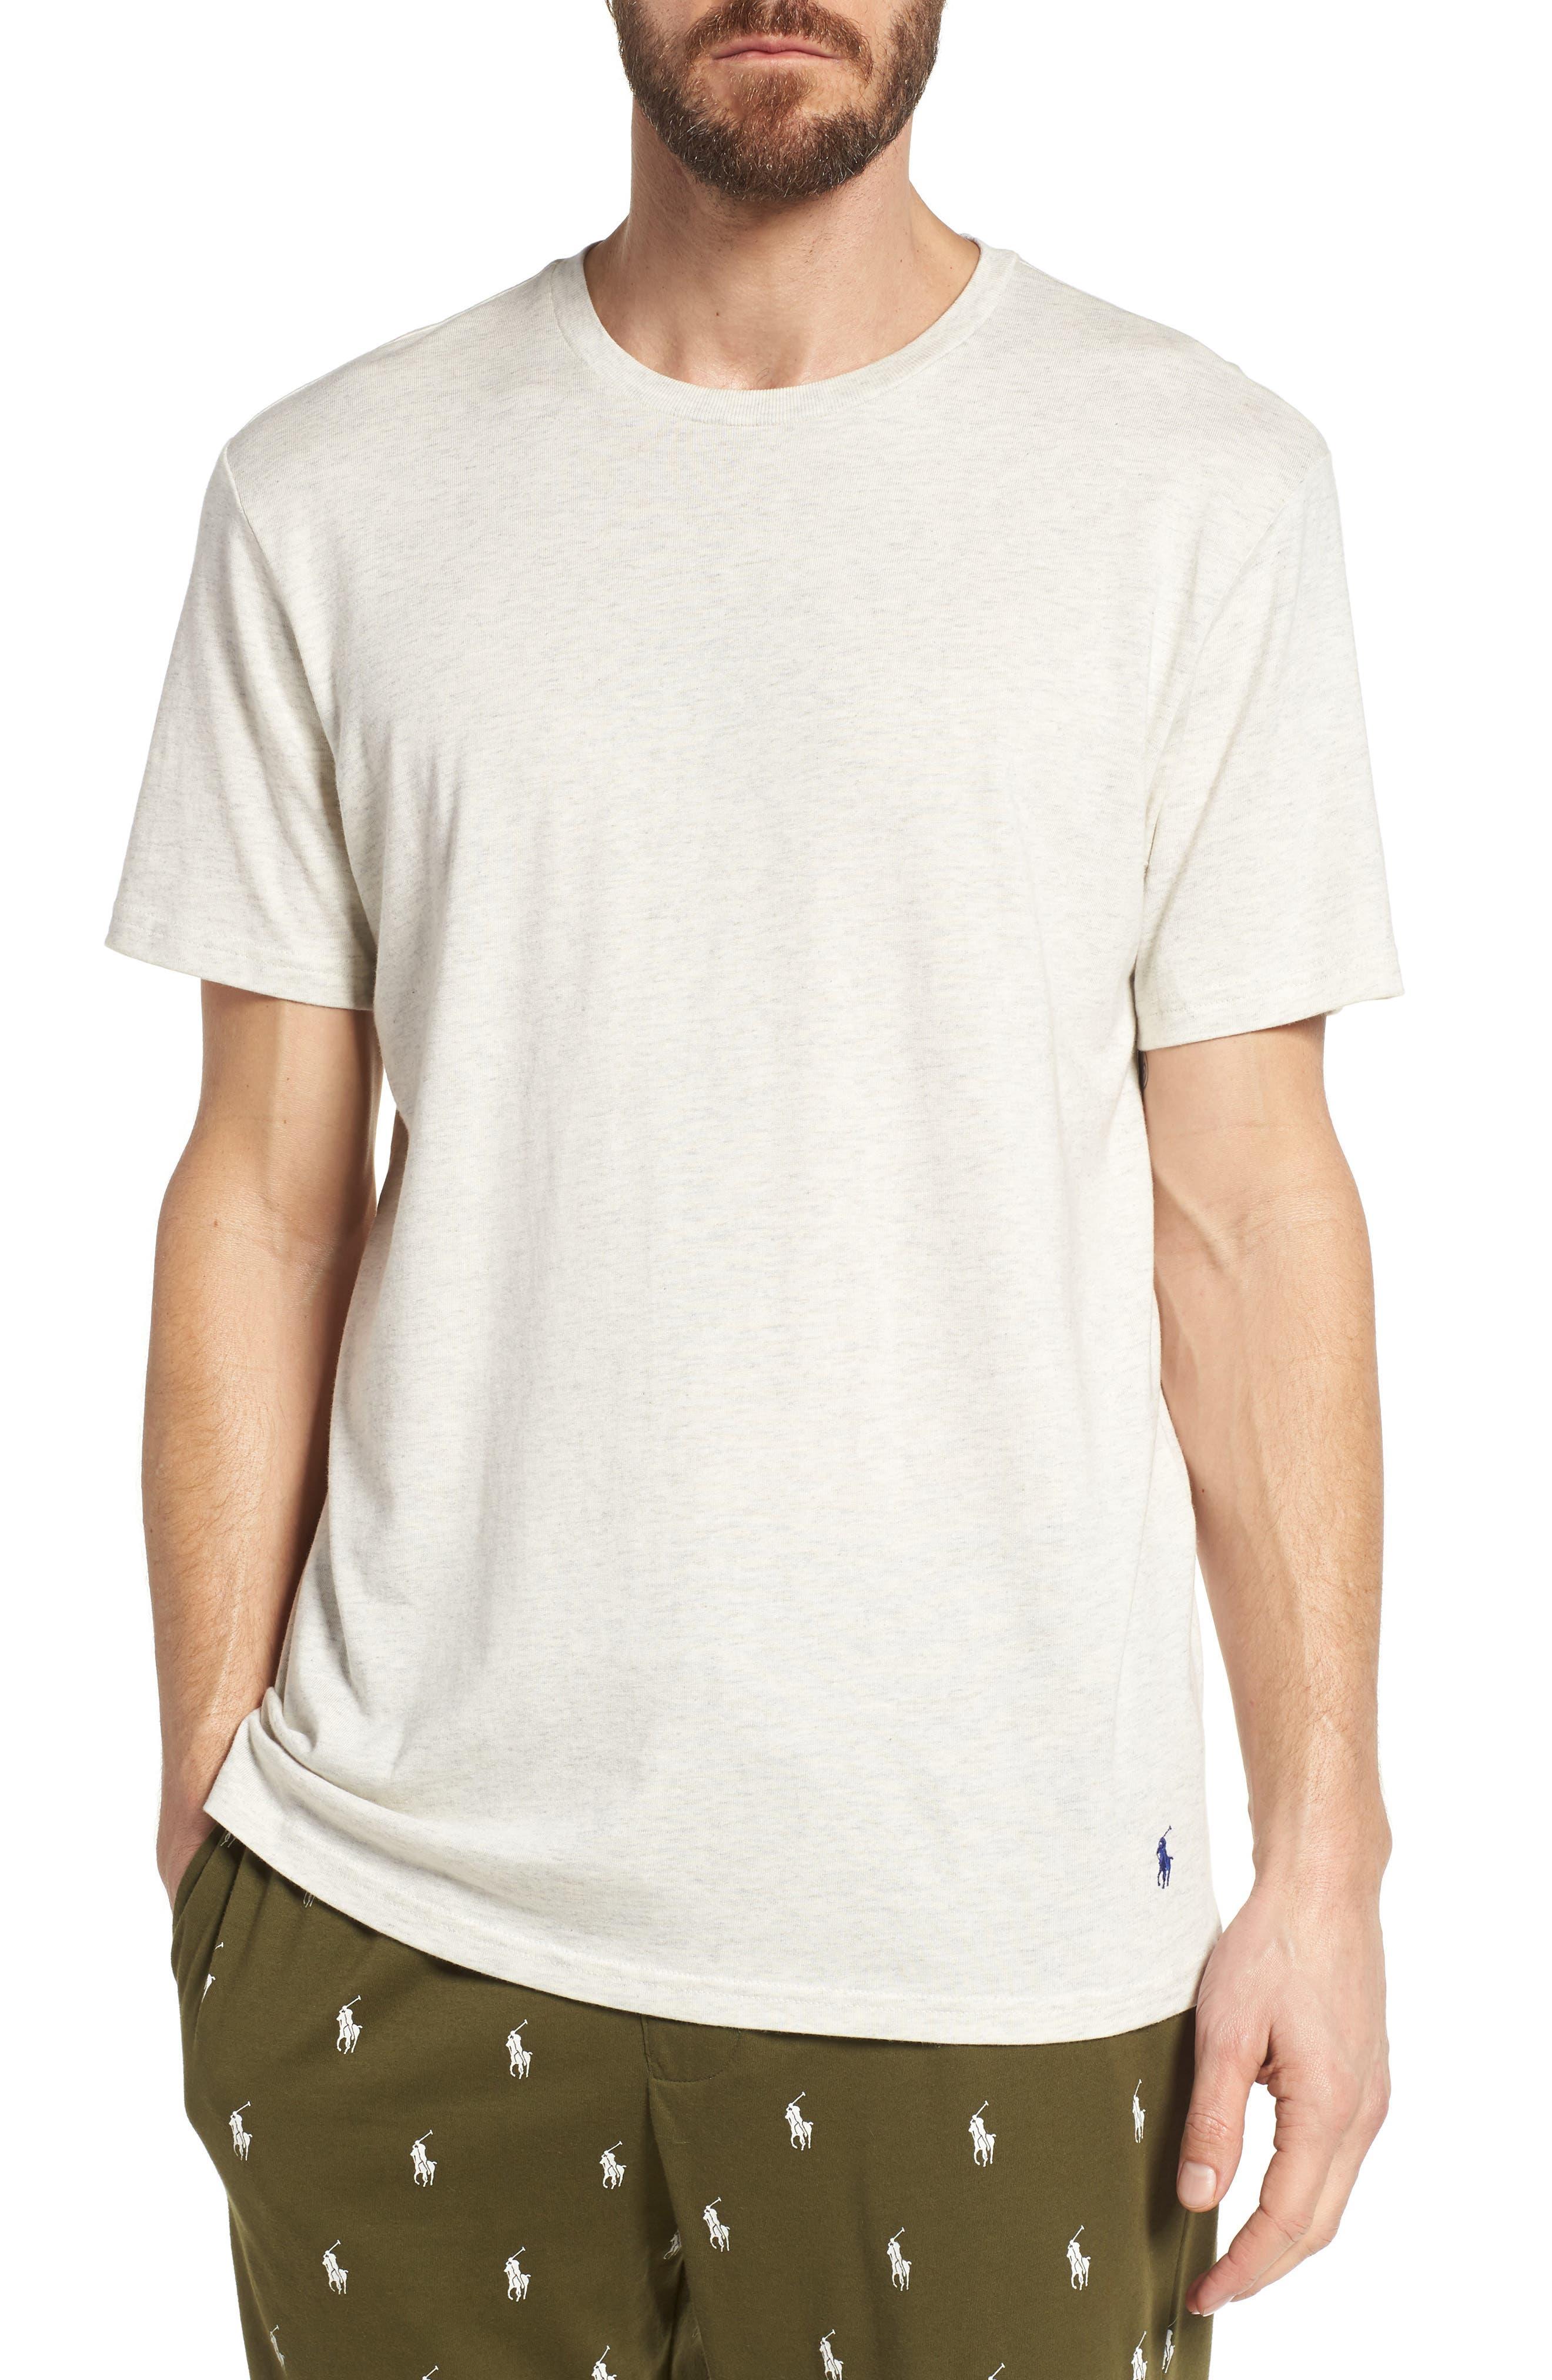 Supreme Comfort Crewneck T-Shirt,                             Main thumbnail 1, color,                             026